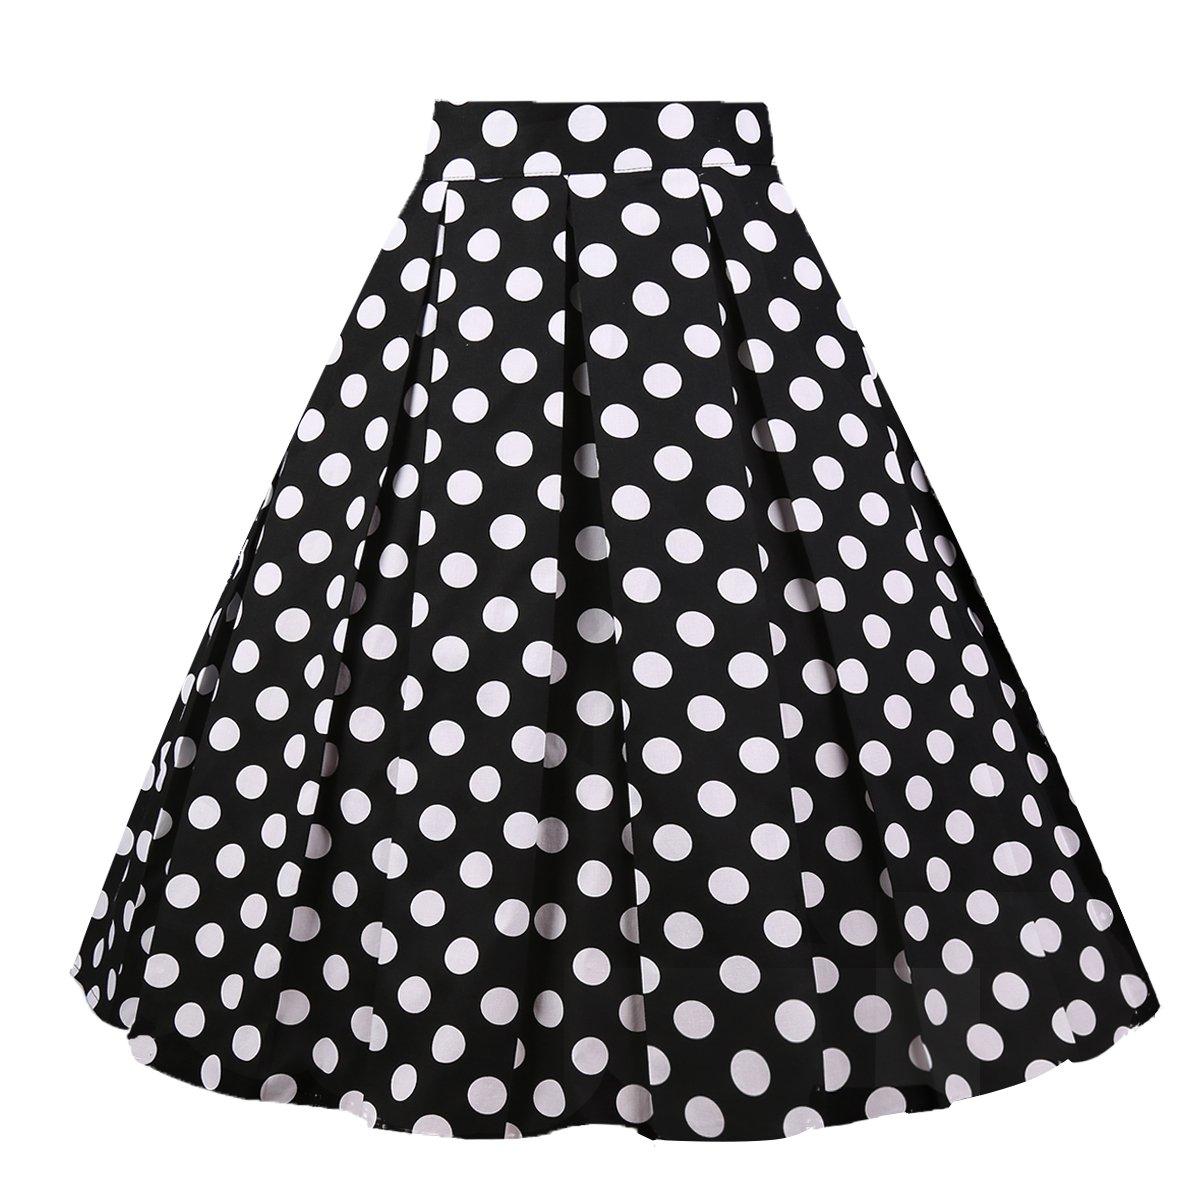 Girstunm Women's Pleated Vintage Skirt Floral Print A-line Midi Skirts with Pockets Black-White-Dot M